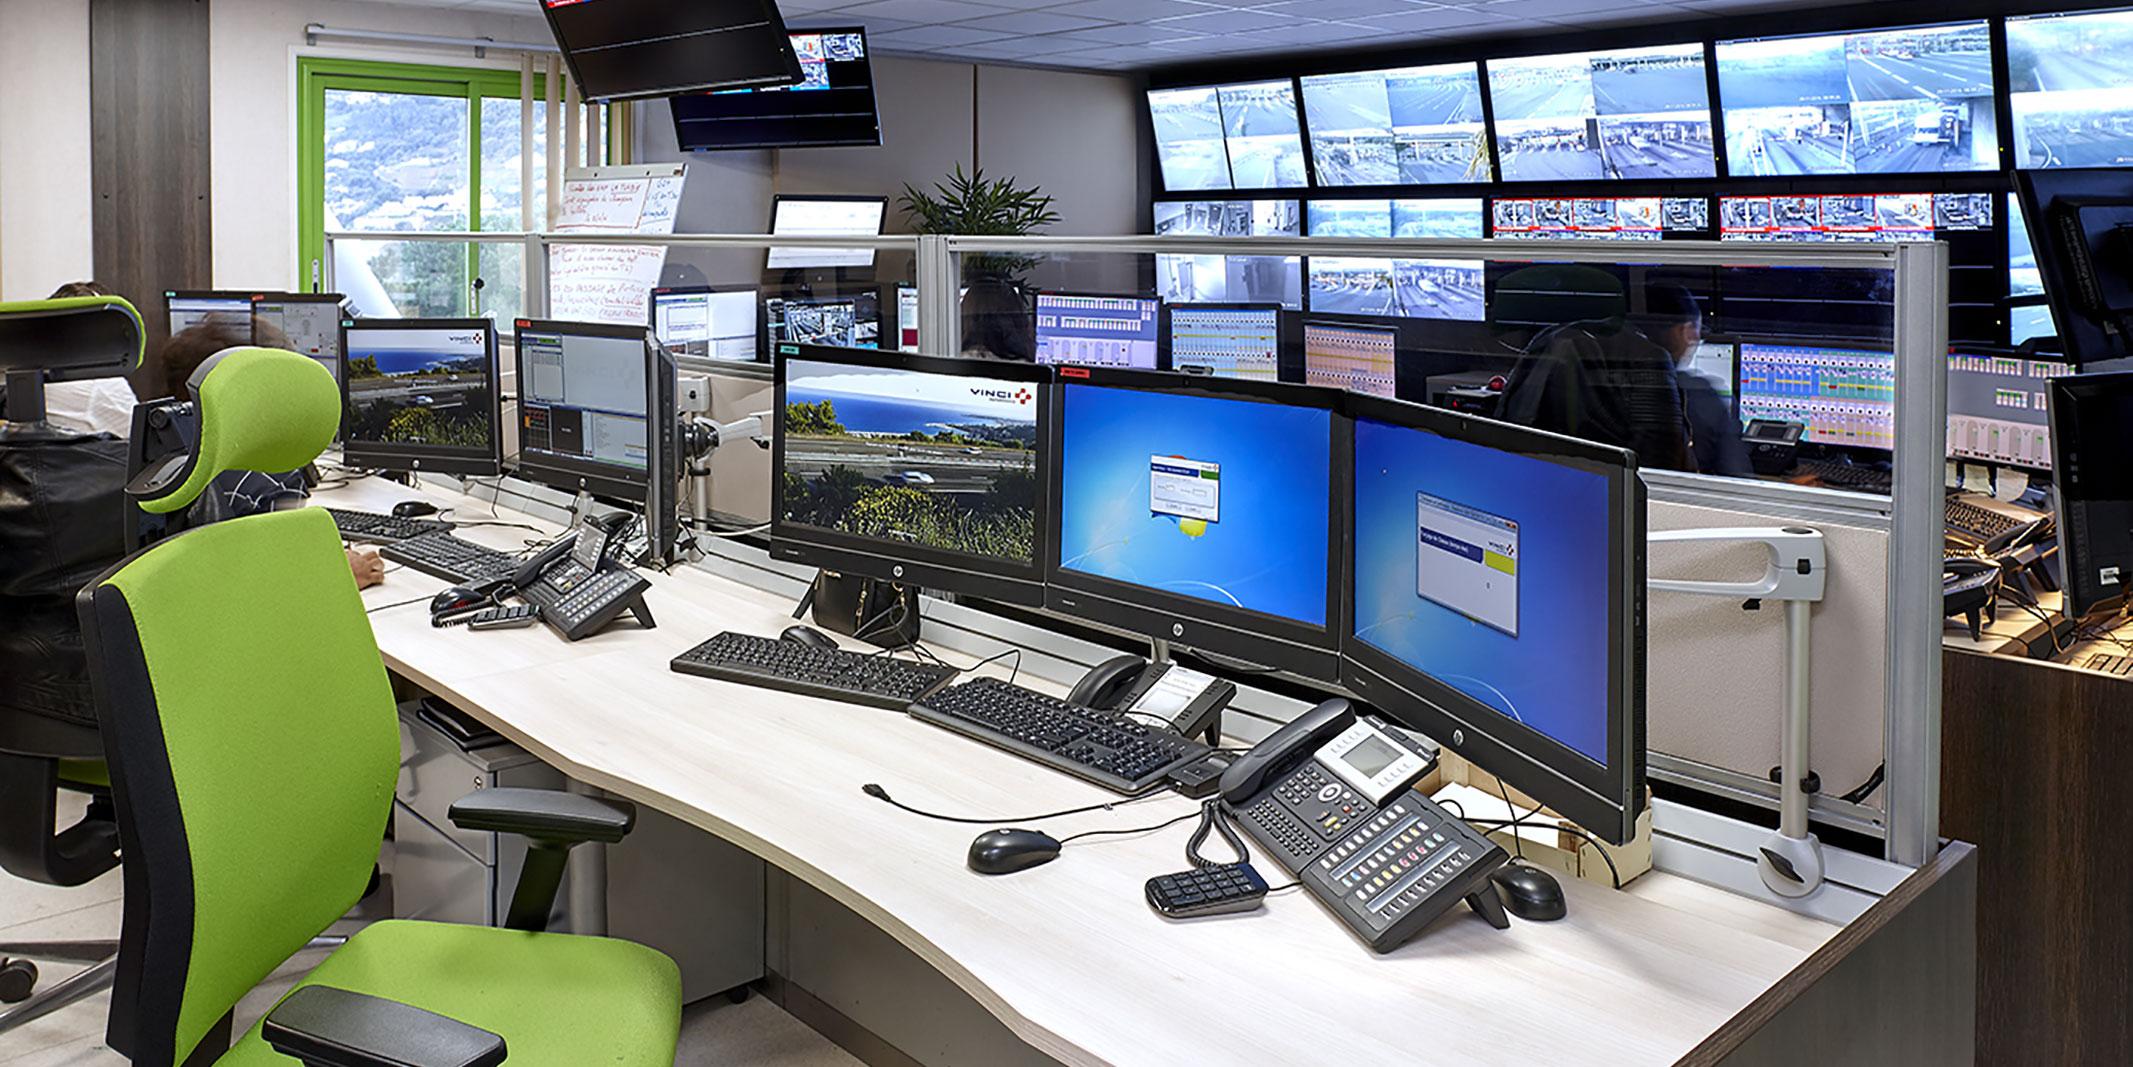 soa agencement salle controle transports public